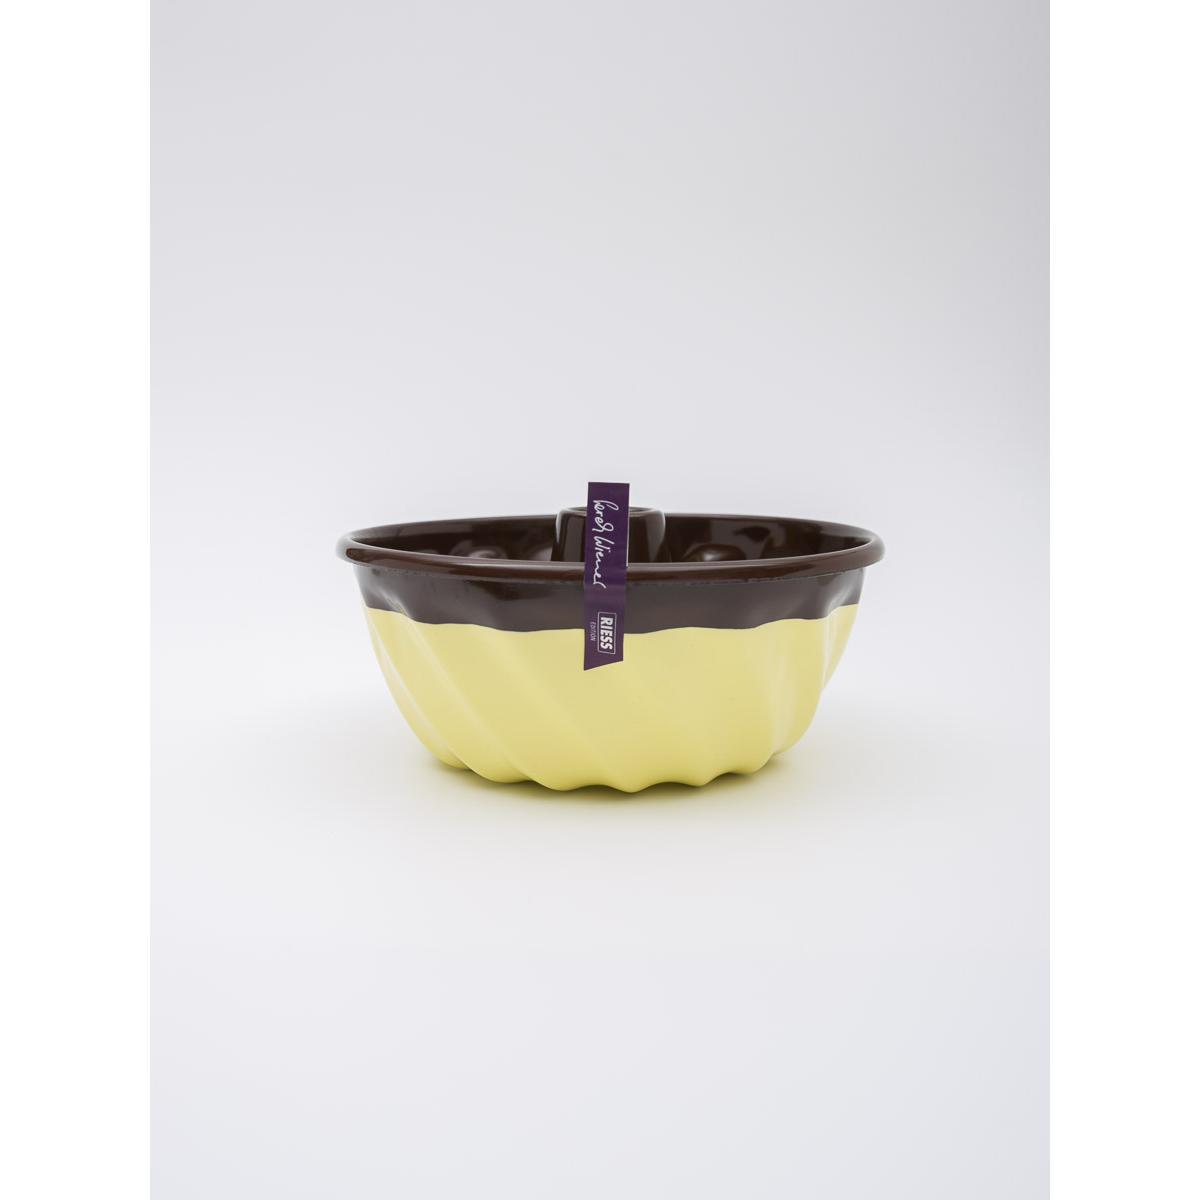 22cm enamel ring cake form - Chocolate with cream